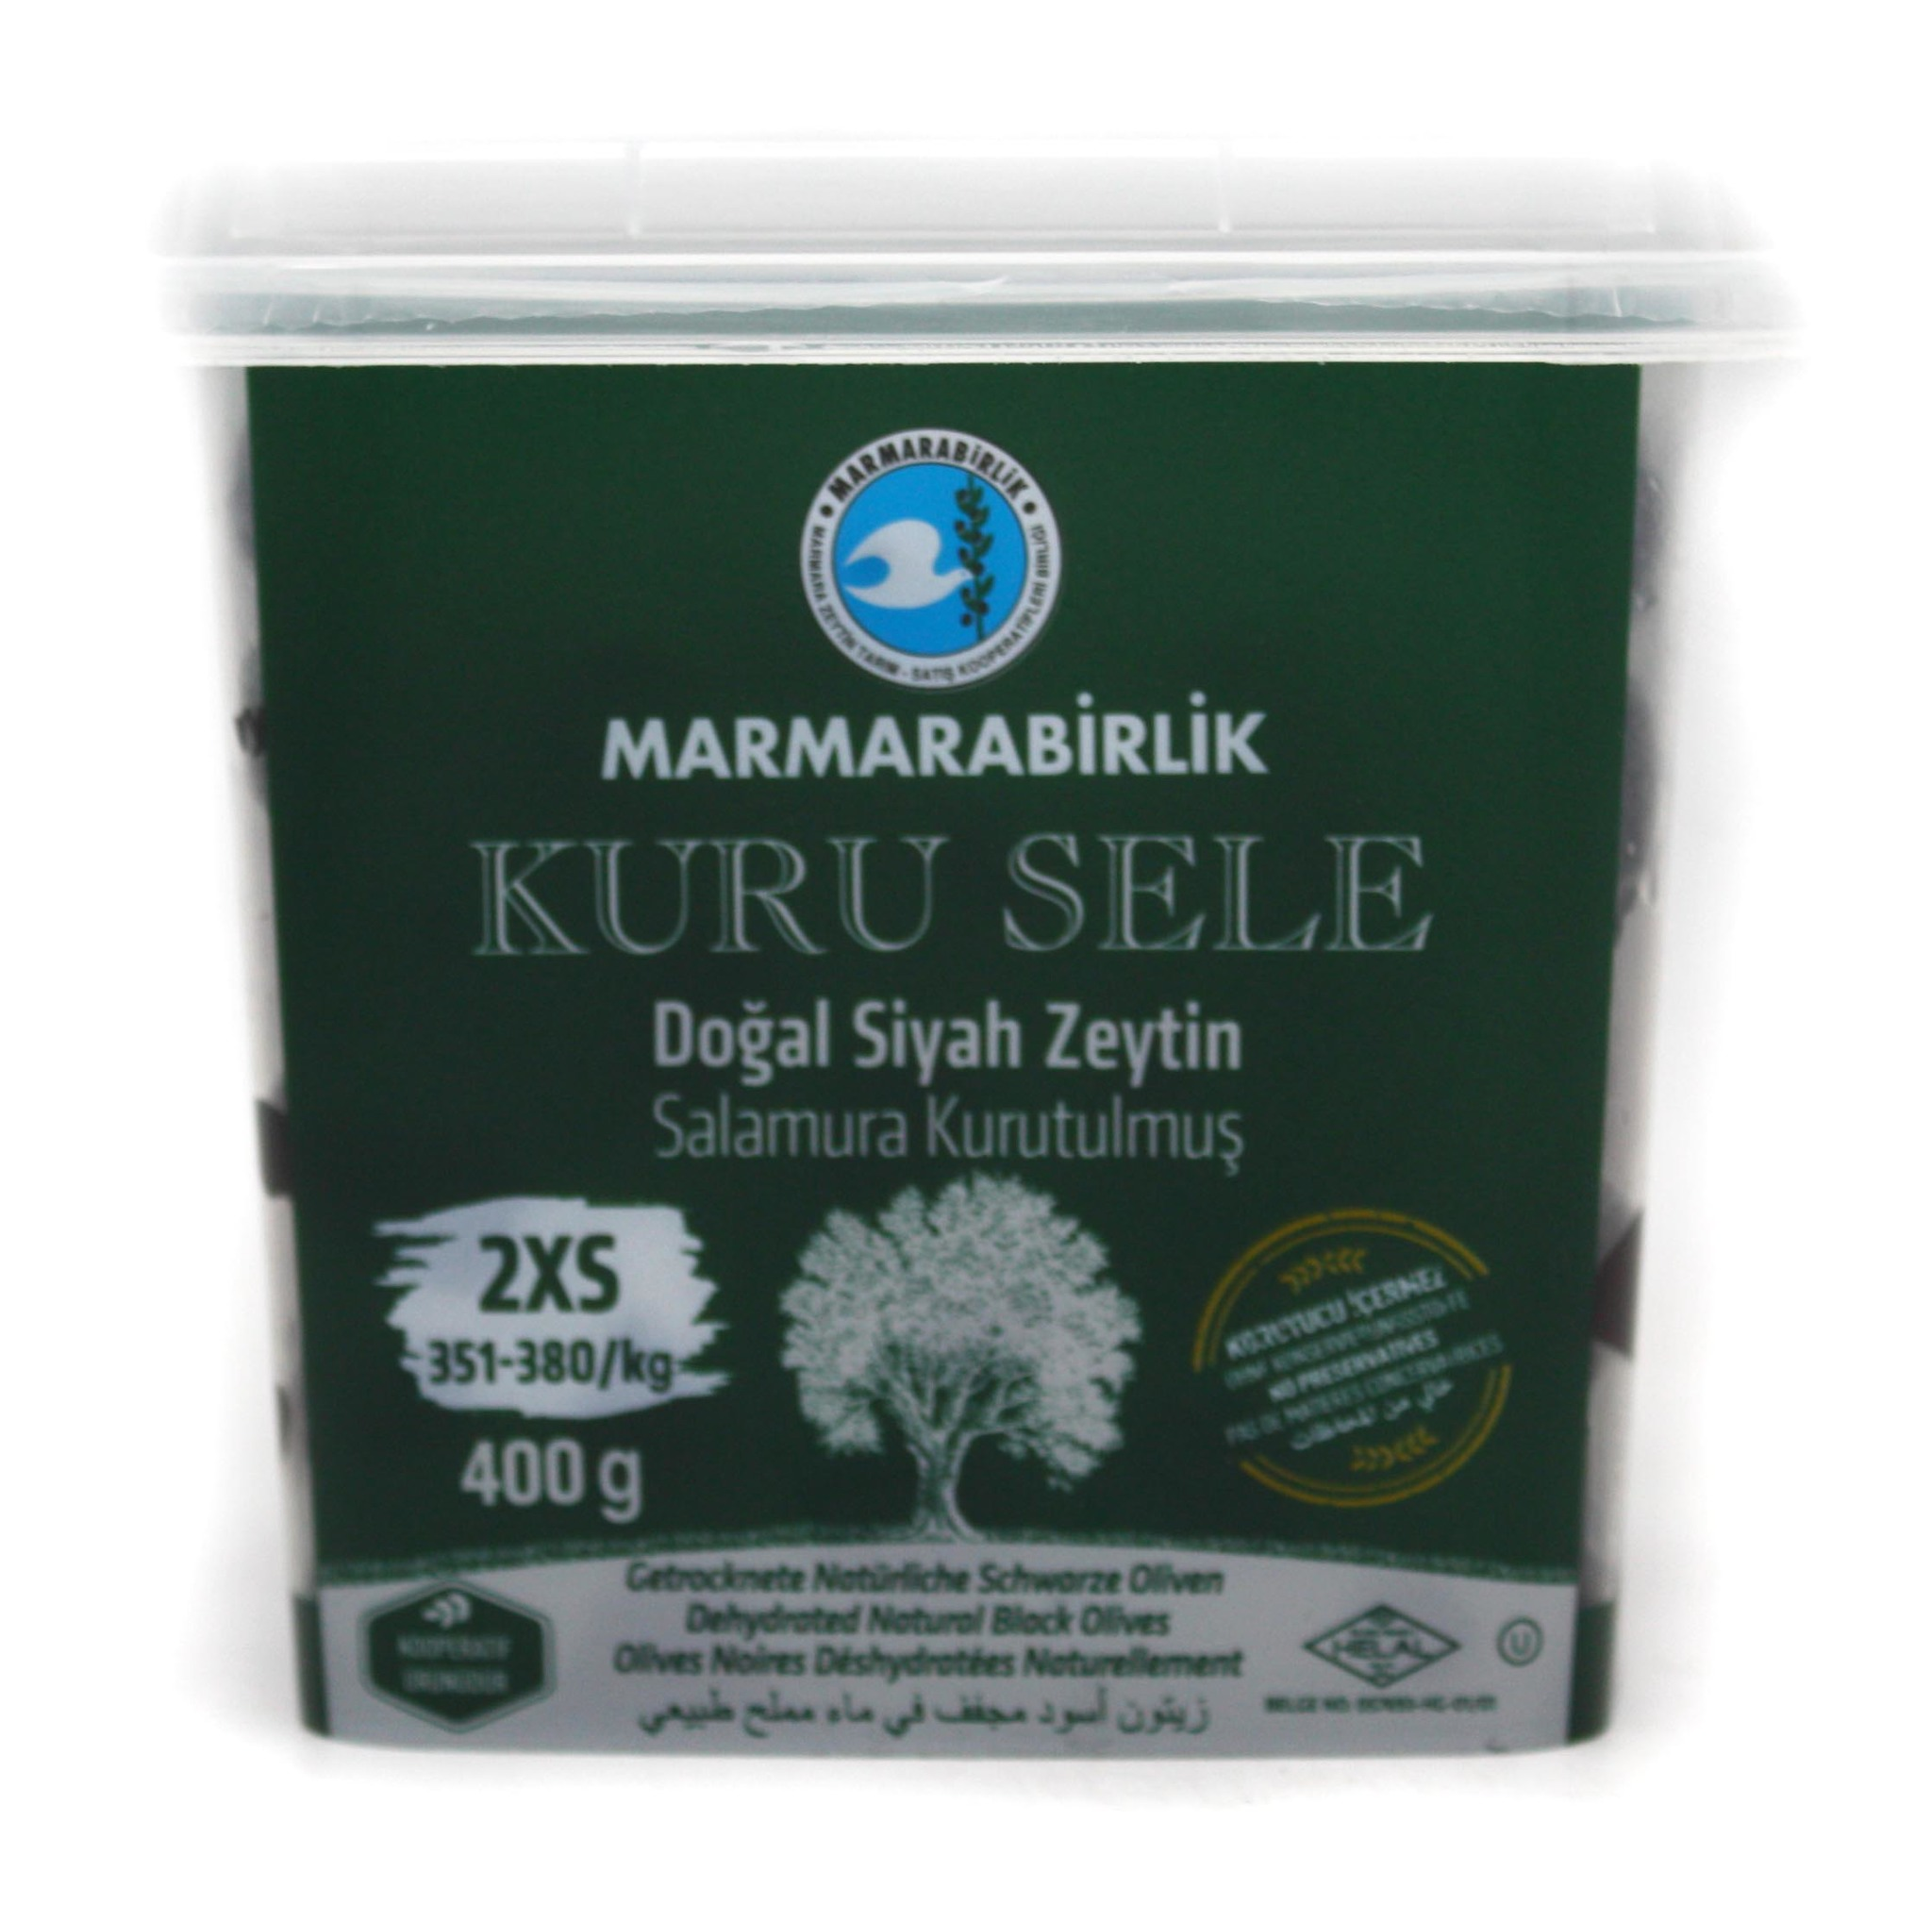 Marmarabirlik Маслины Kuru Sele вяленые 2XS, Marmarabirlik, 400 г import_files_d3_d340ec4f222a11eaa9c6484d7ecee297_669fcc0d233211eaa9c6484d7ecee297.jpg